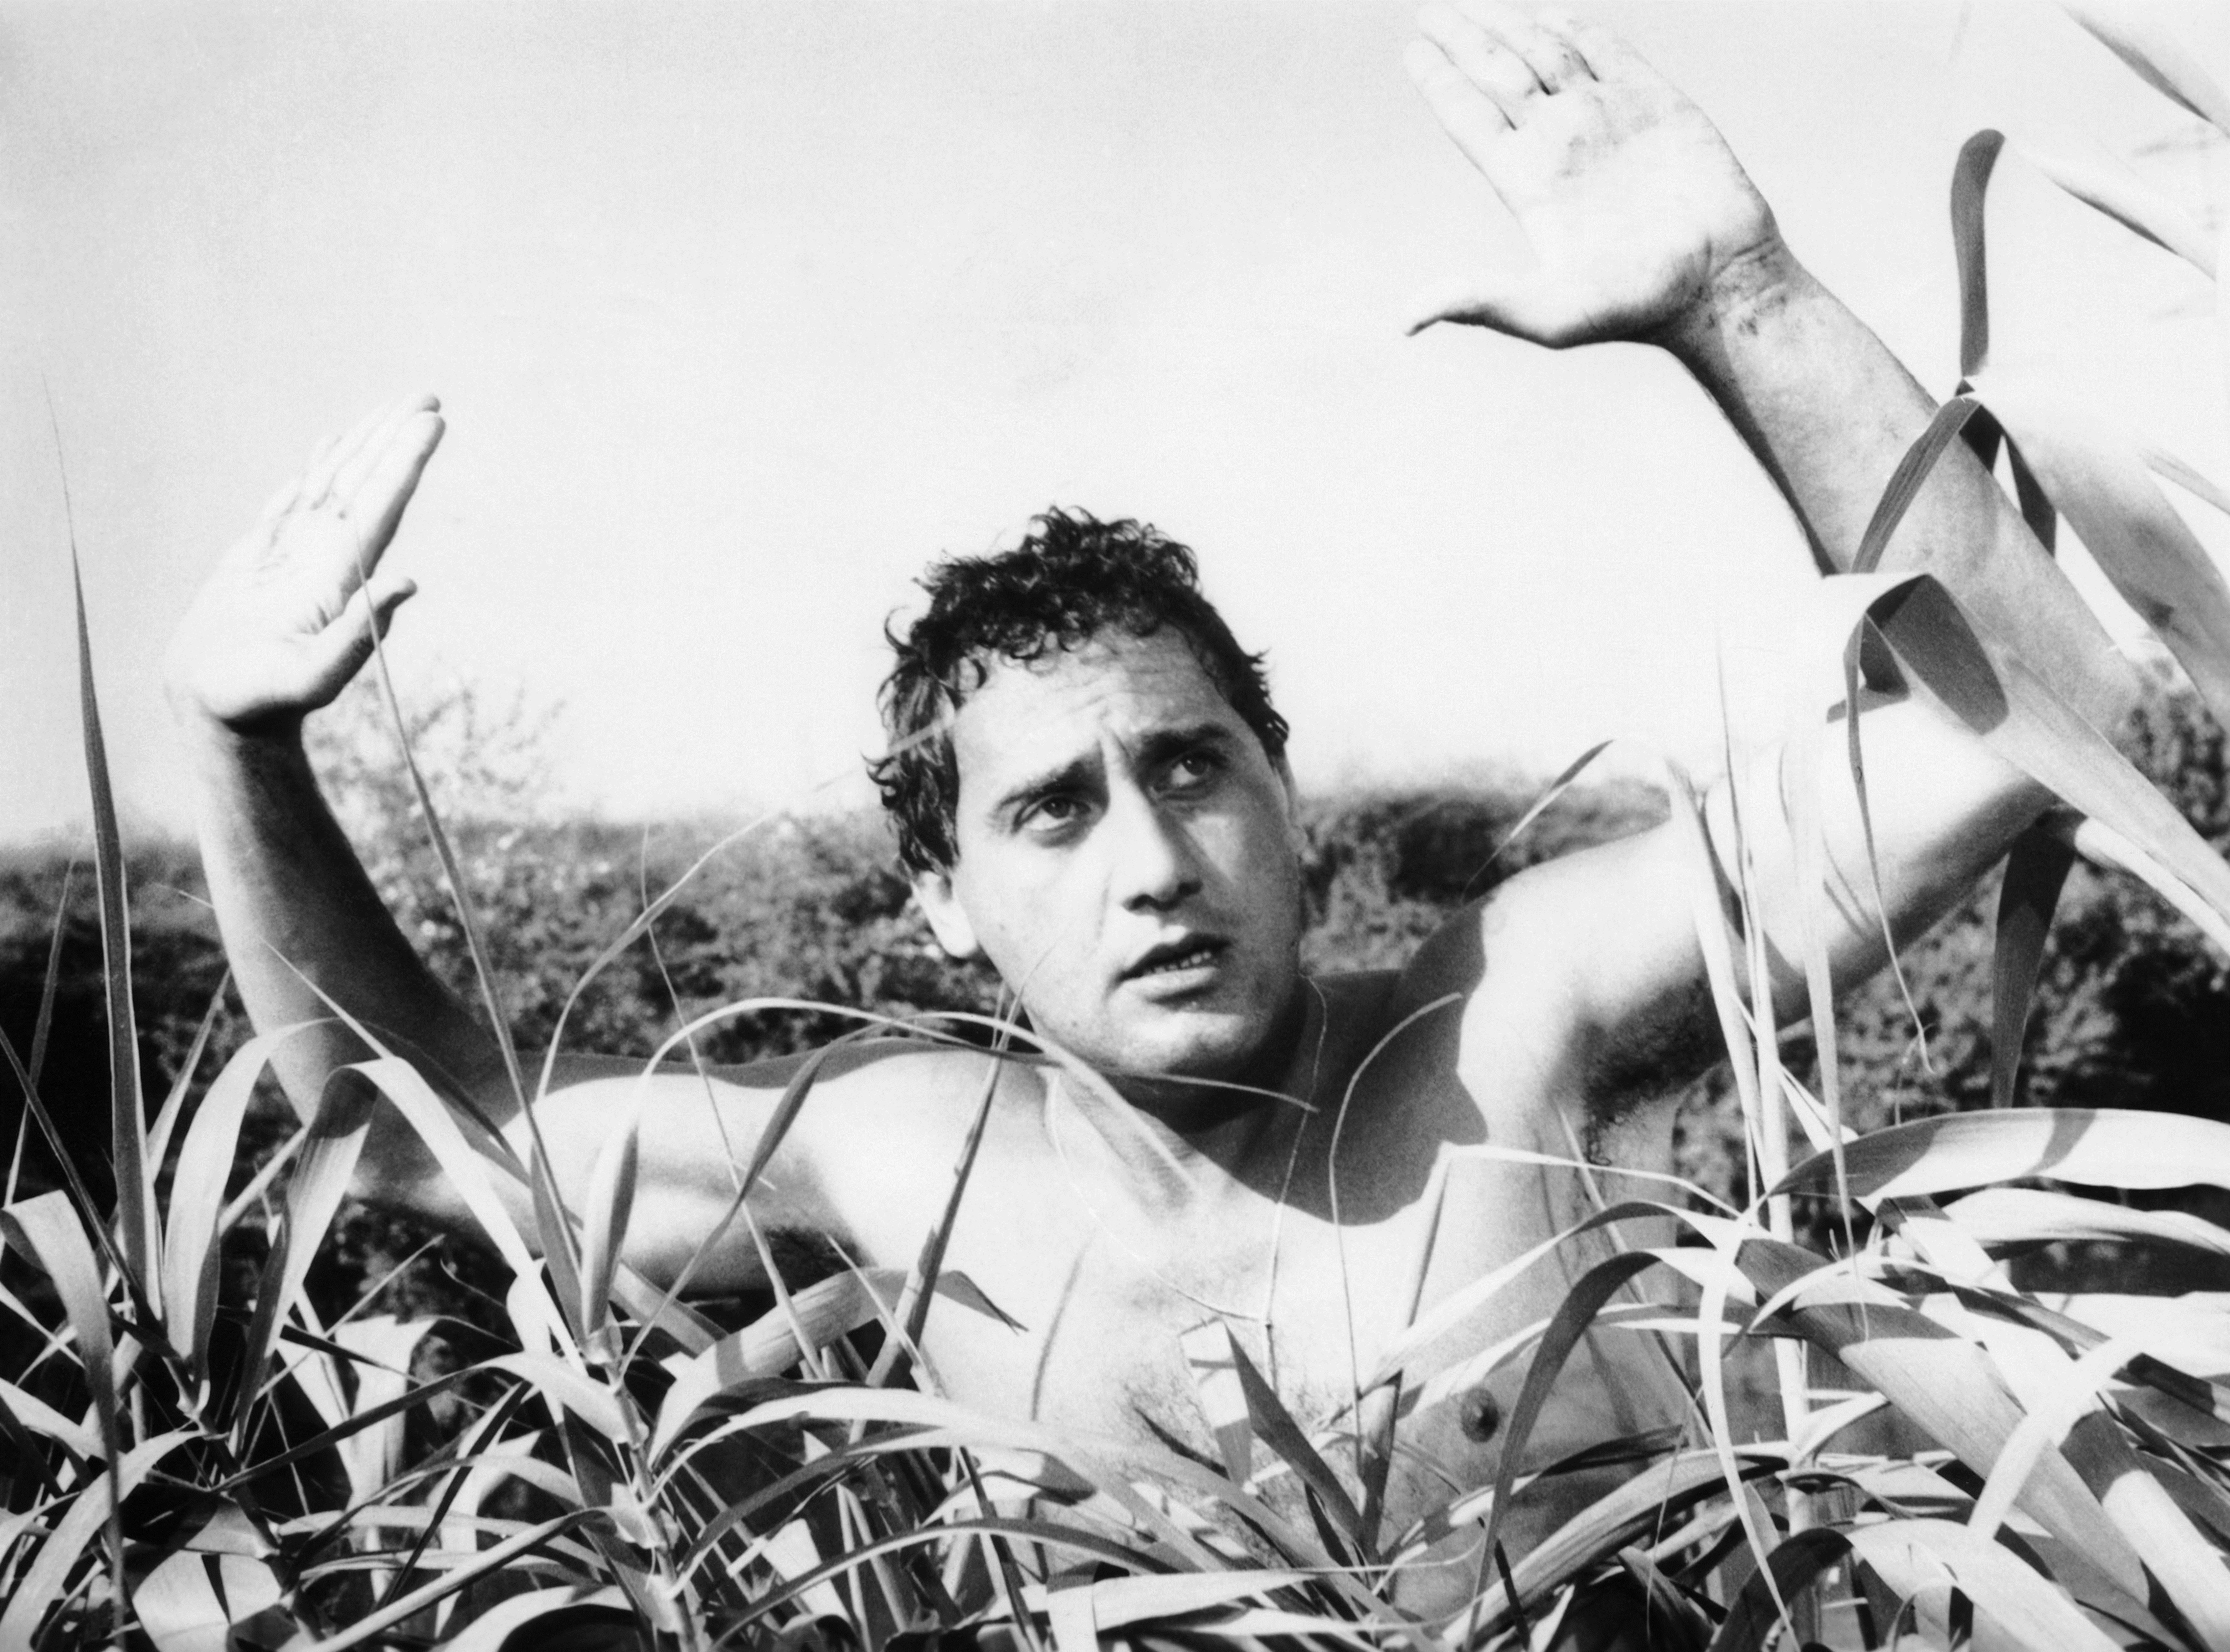 Alberto Sordi. La vita, i film - Cinema - Rai Cultura